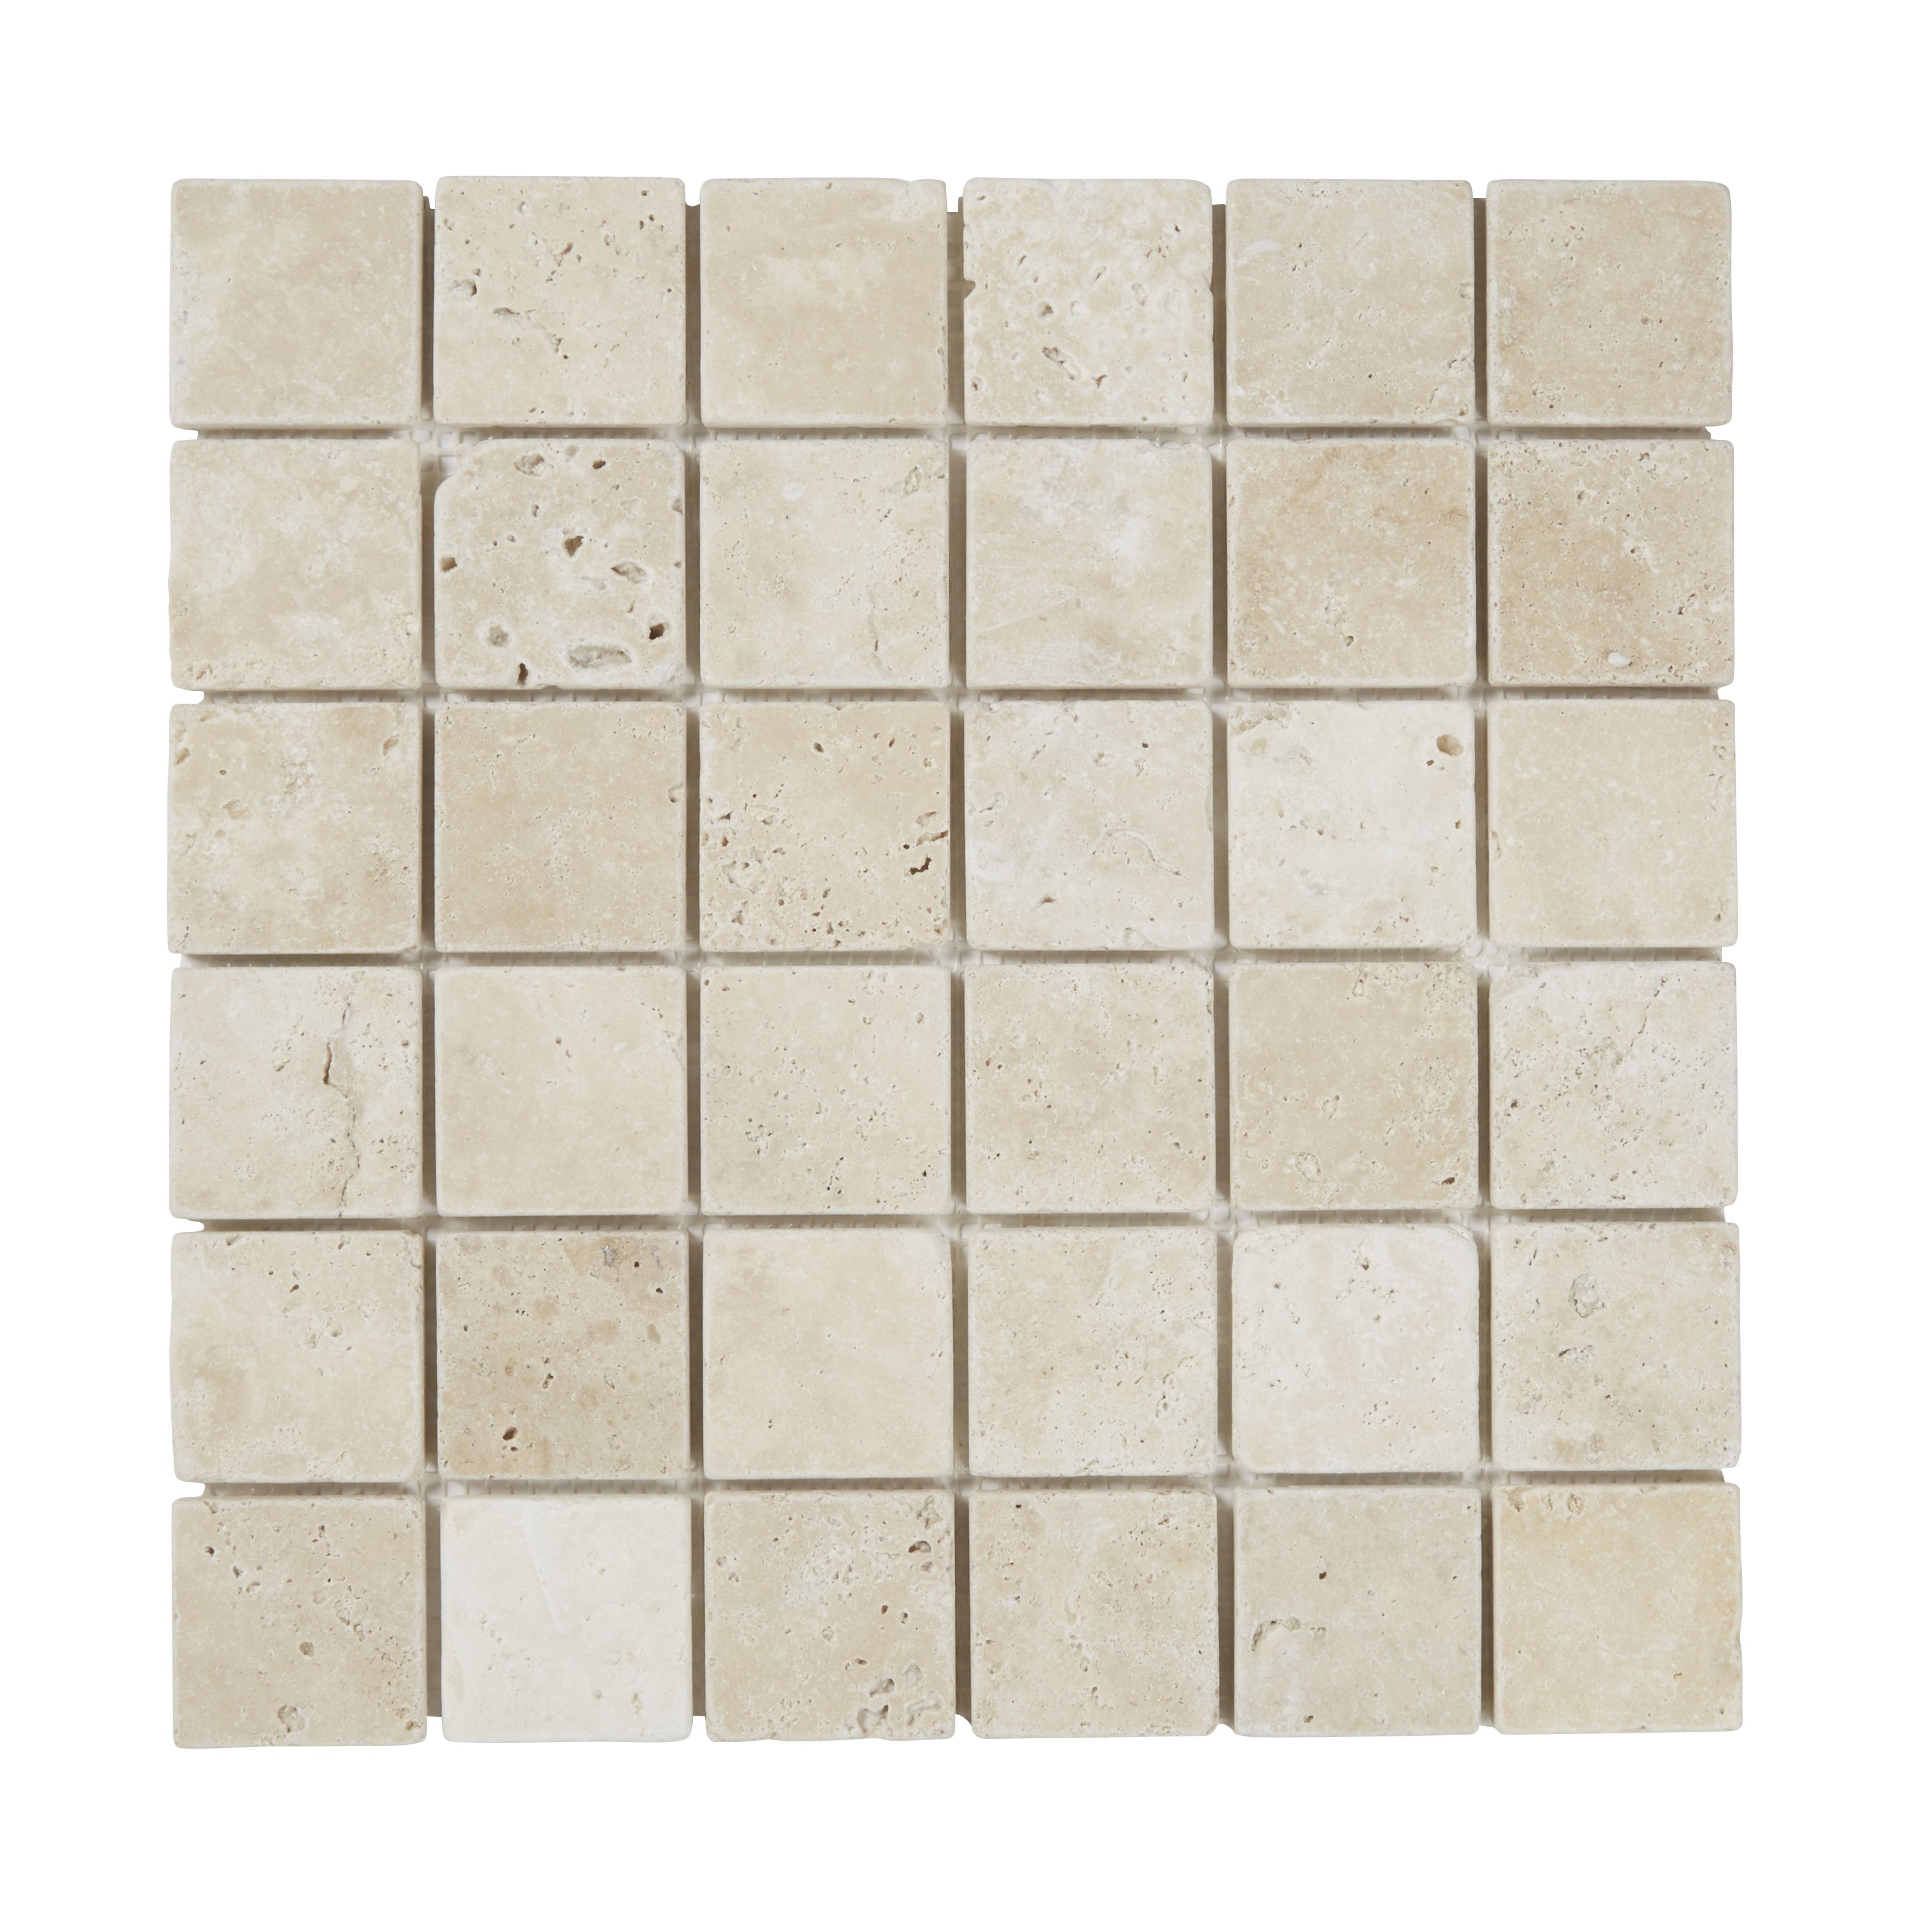 Verono Beige Travertine Mosaic Tile, (l)300mm (w)300mm